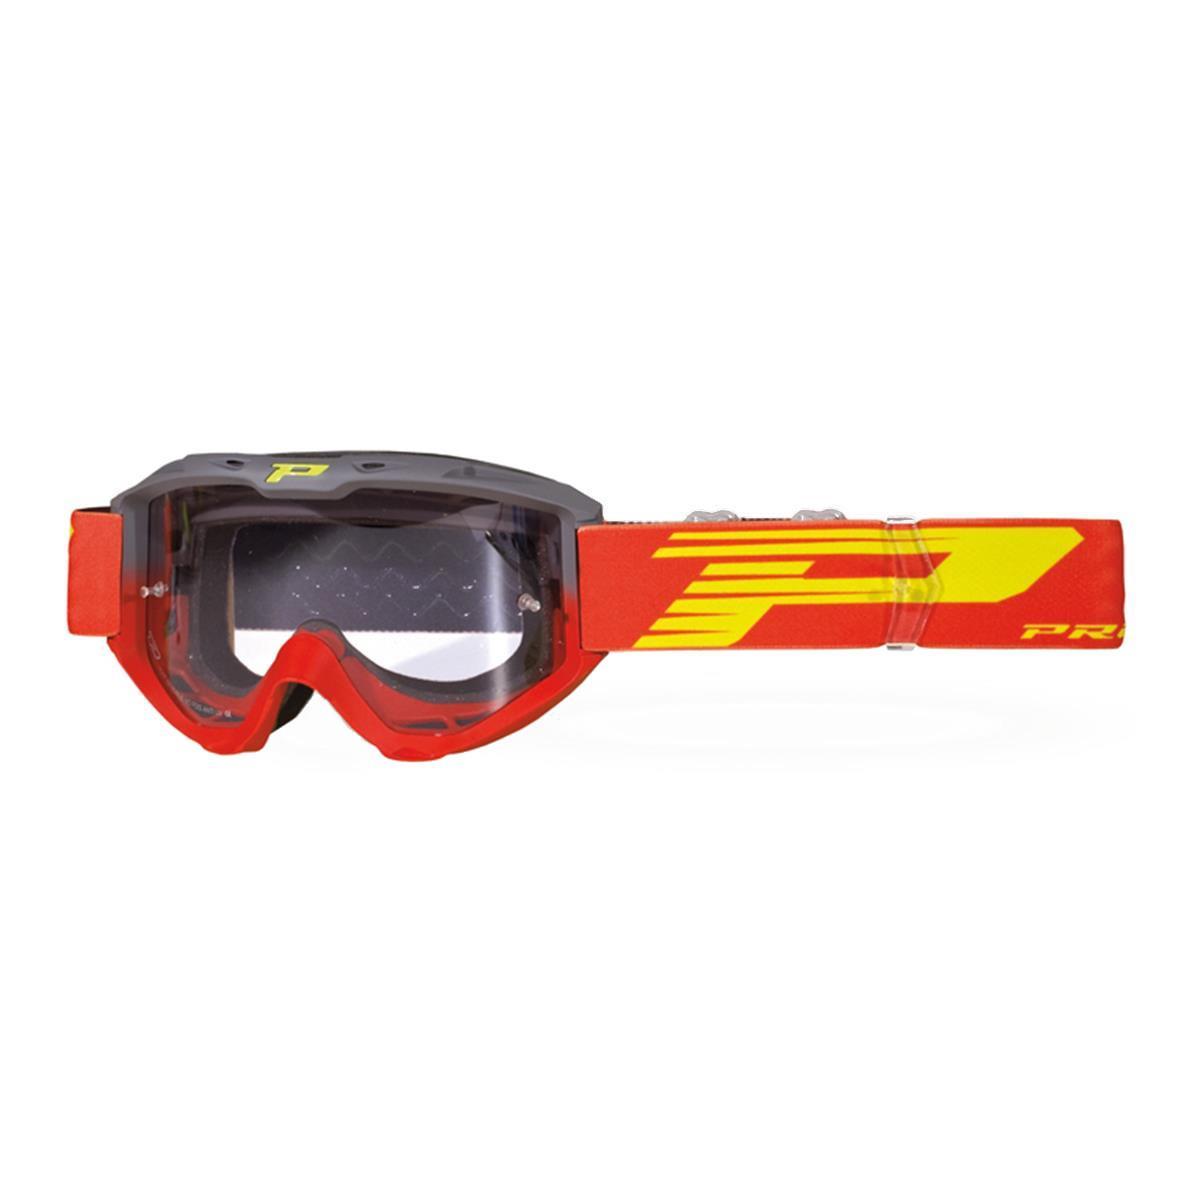 ProGrip Crossbrille 3450 LS Riot Grau/Rot